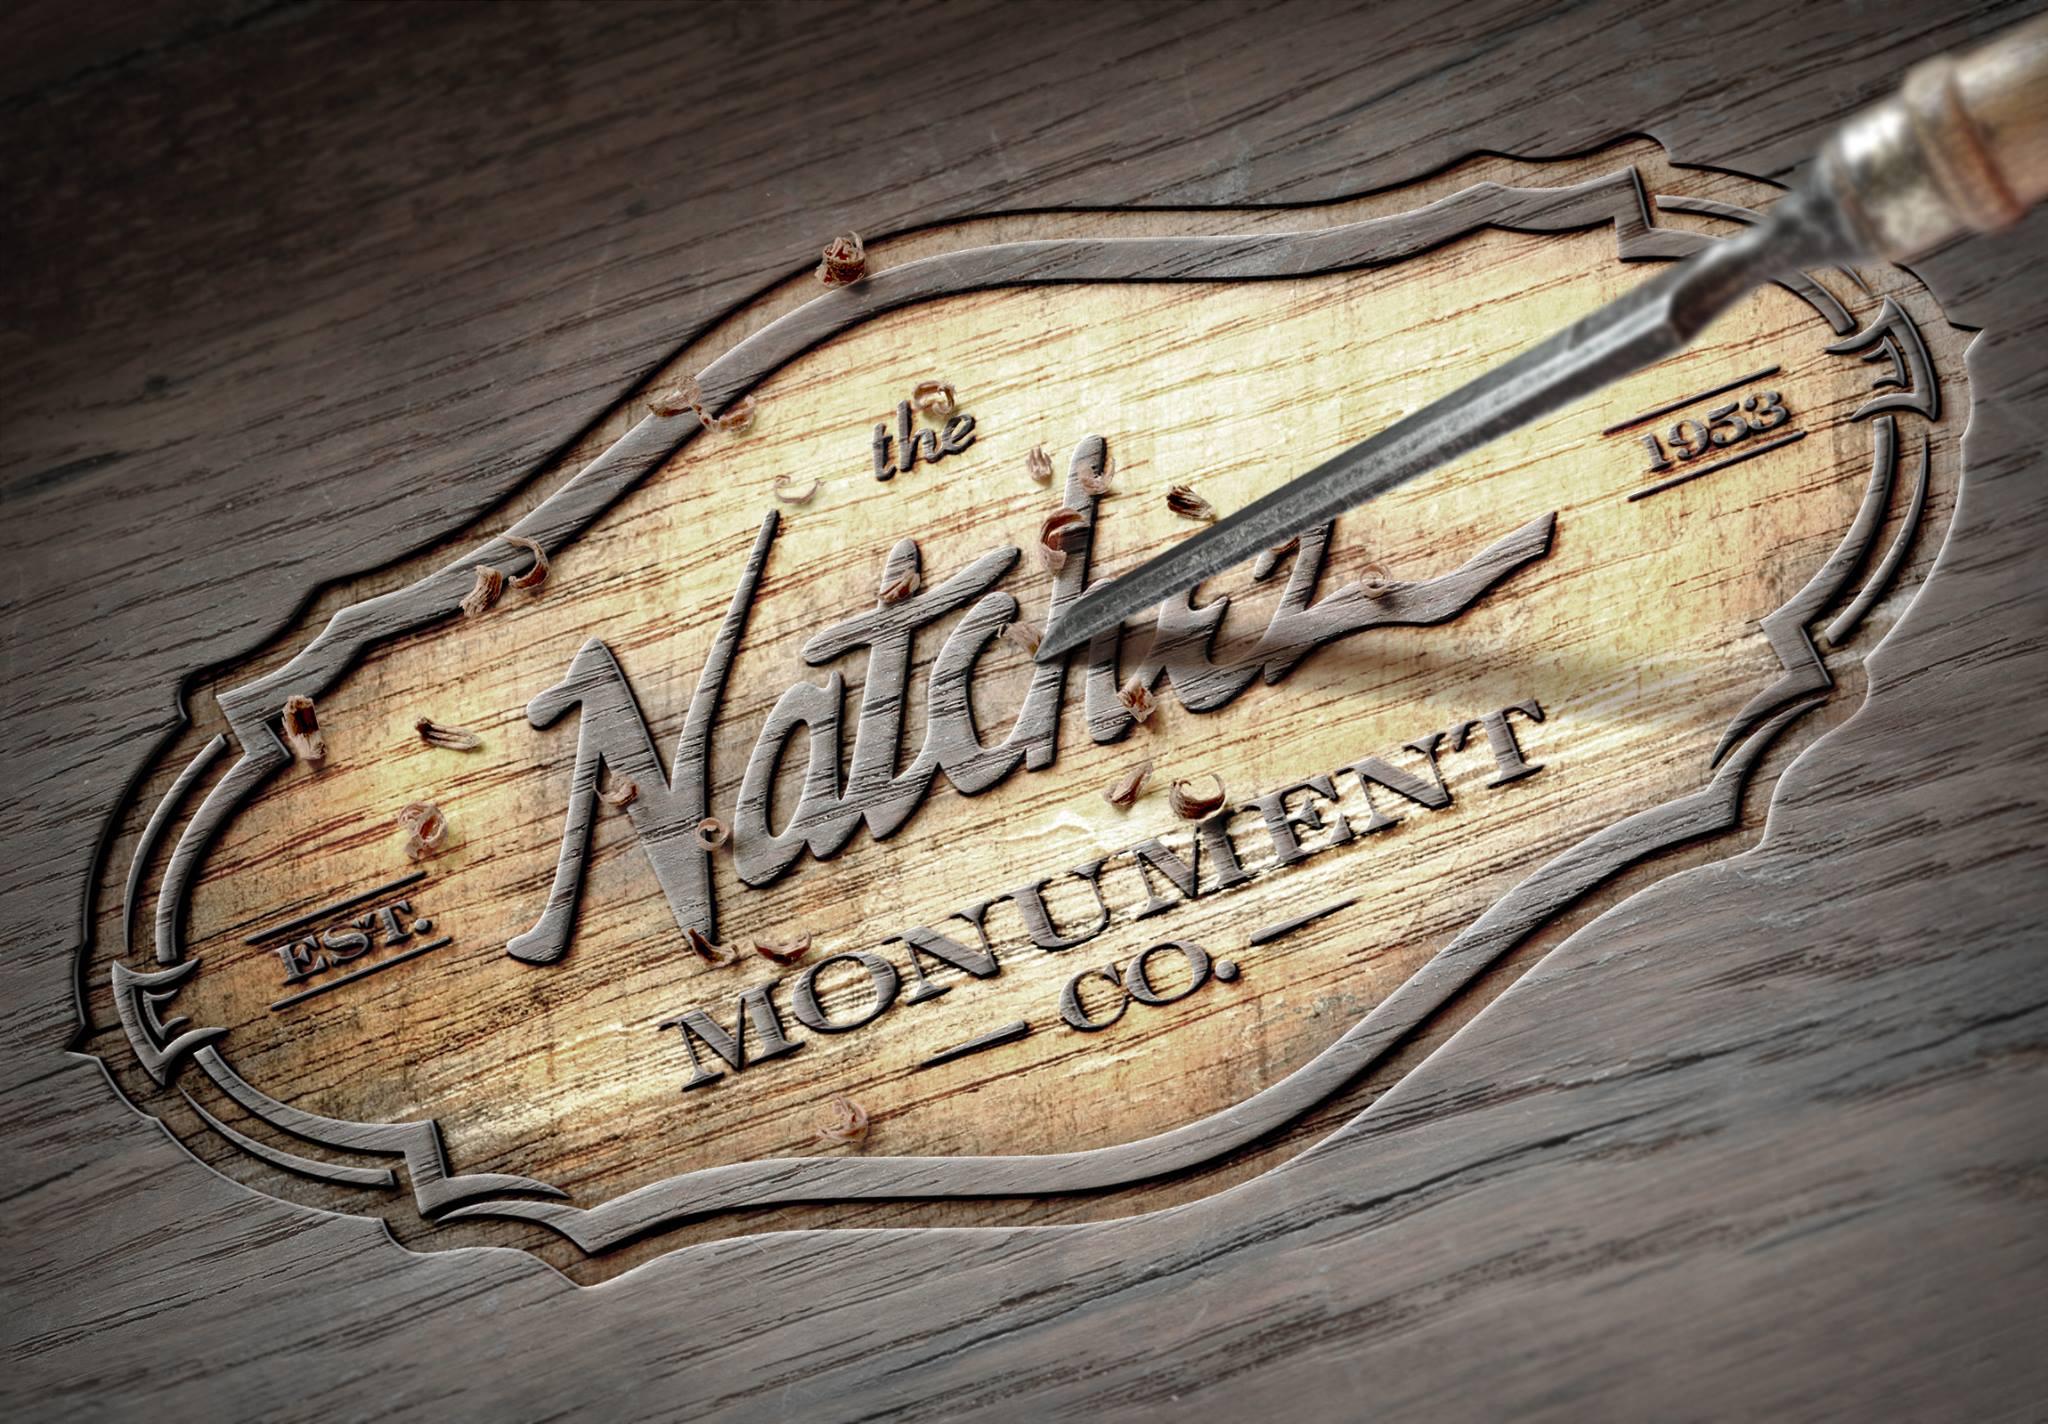 Natchez-Monument-Company-Carved.jpg